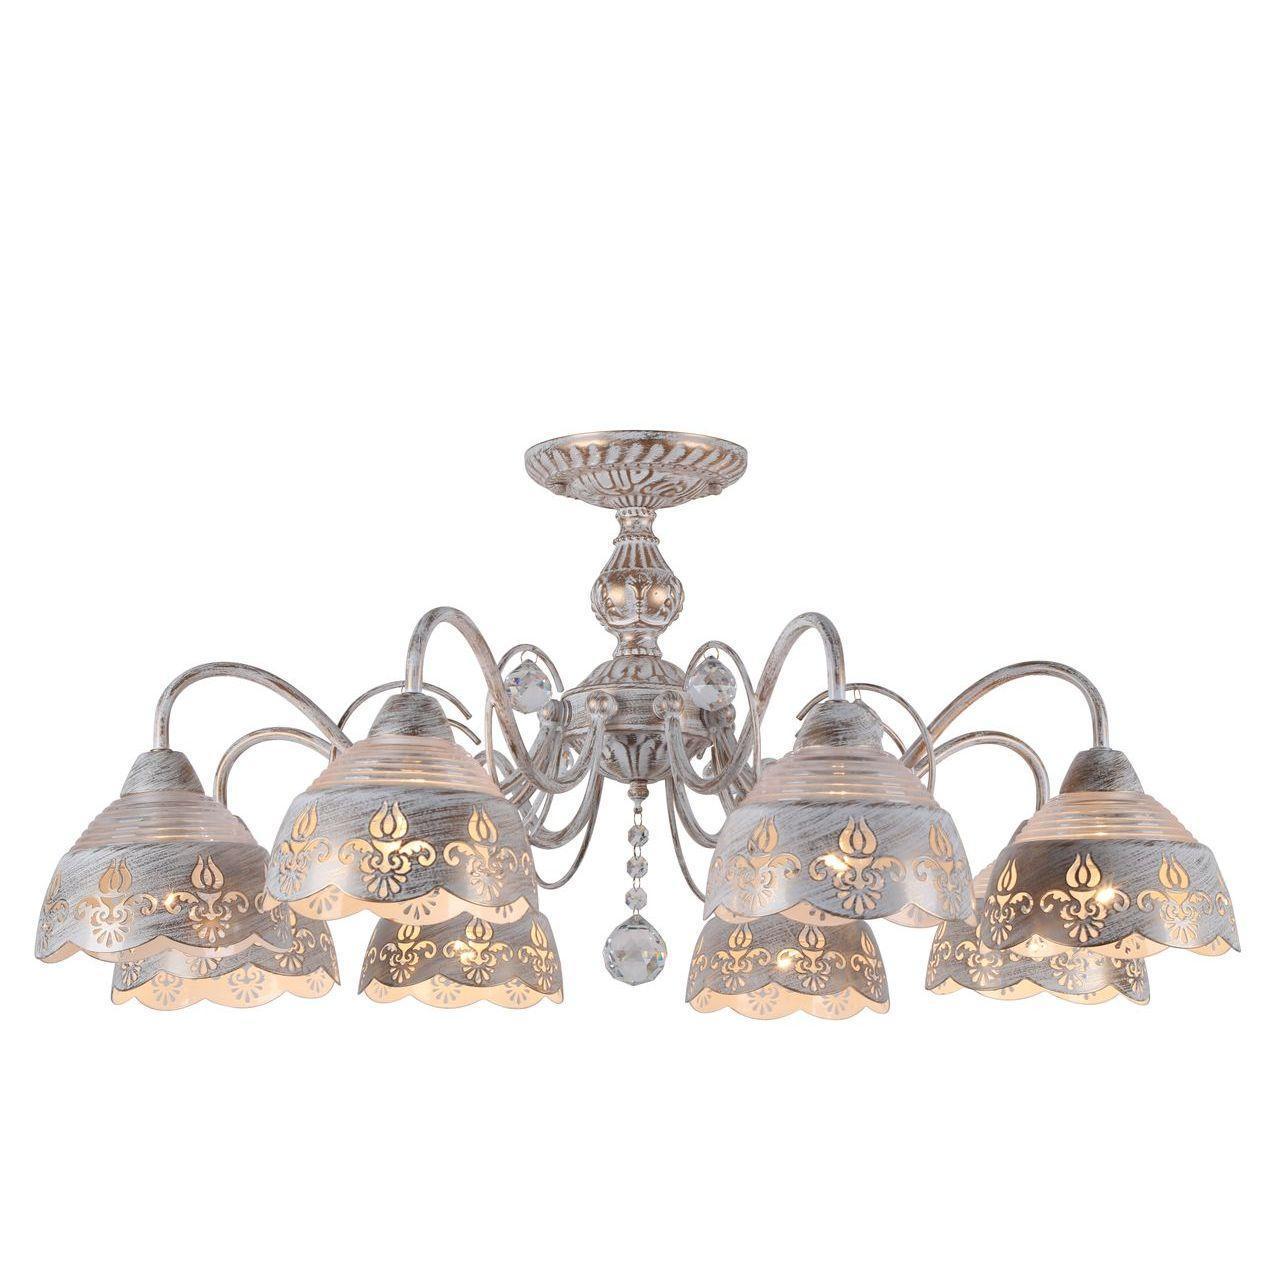 Люстра Arte Lamp Sicilia A9106PL-8WG потолочная arte lamp потолочная люстра arte lamp sicilia a9106pl 3wg